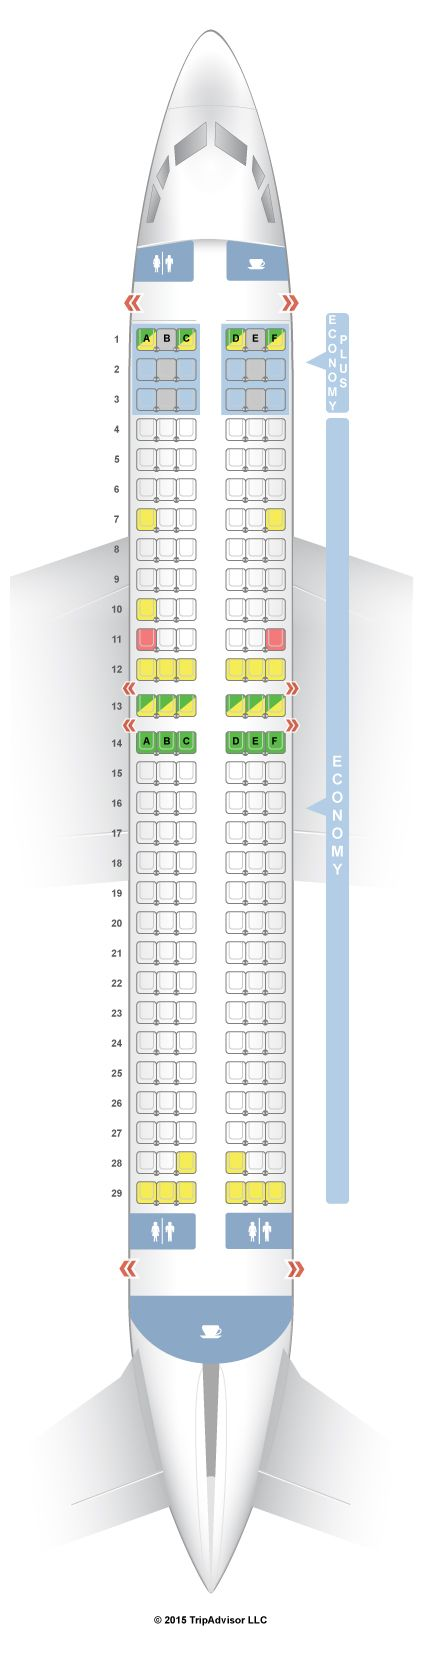 SeatGuru Seat Map WestJet Boeing 737-800 (738)